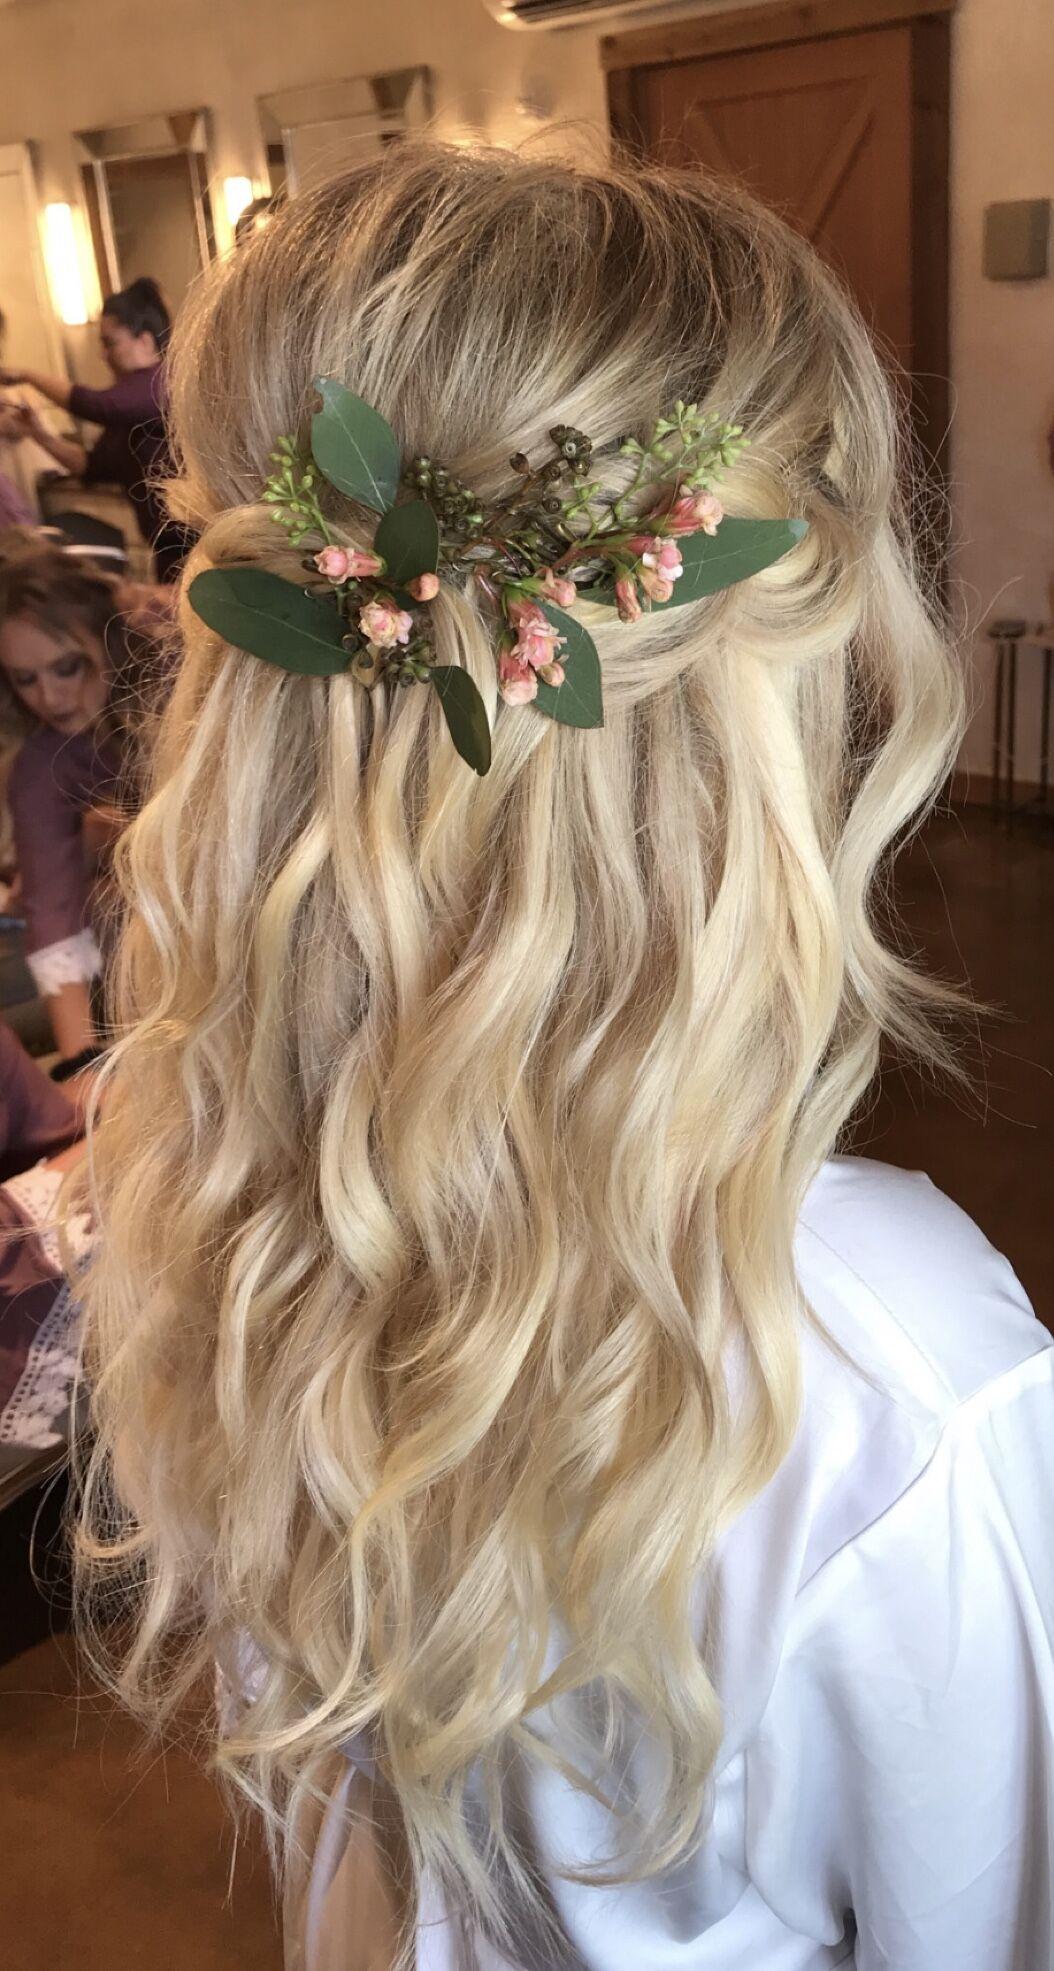 beauty salons in nashville, tn - the knot